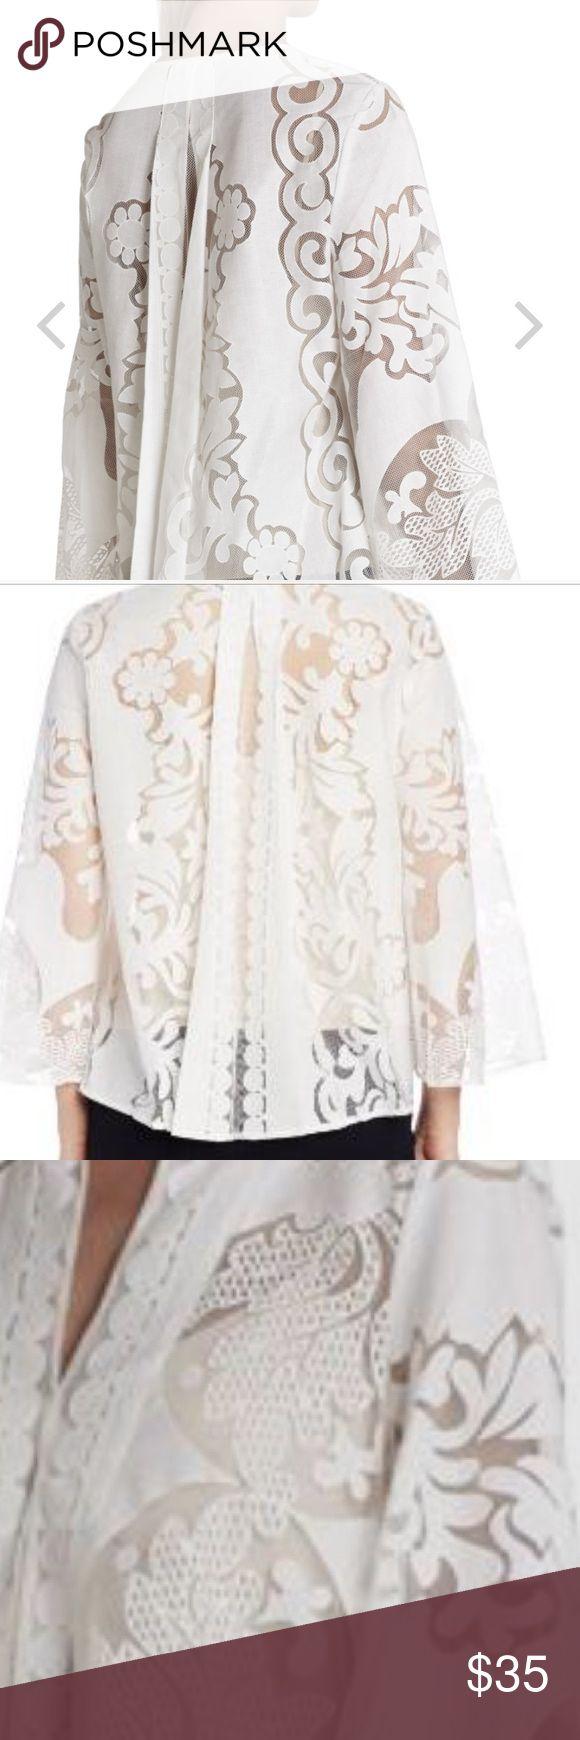 BCBG Milou top Worn once. Size small. Nude vest underlay. Beautiful feminine piece. BCBG Tops